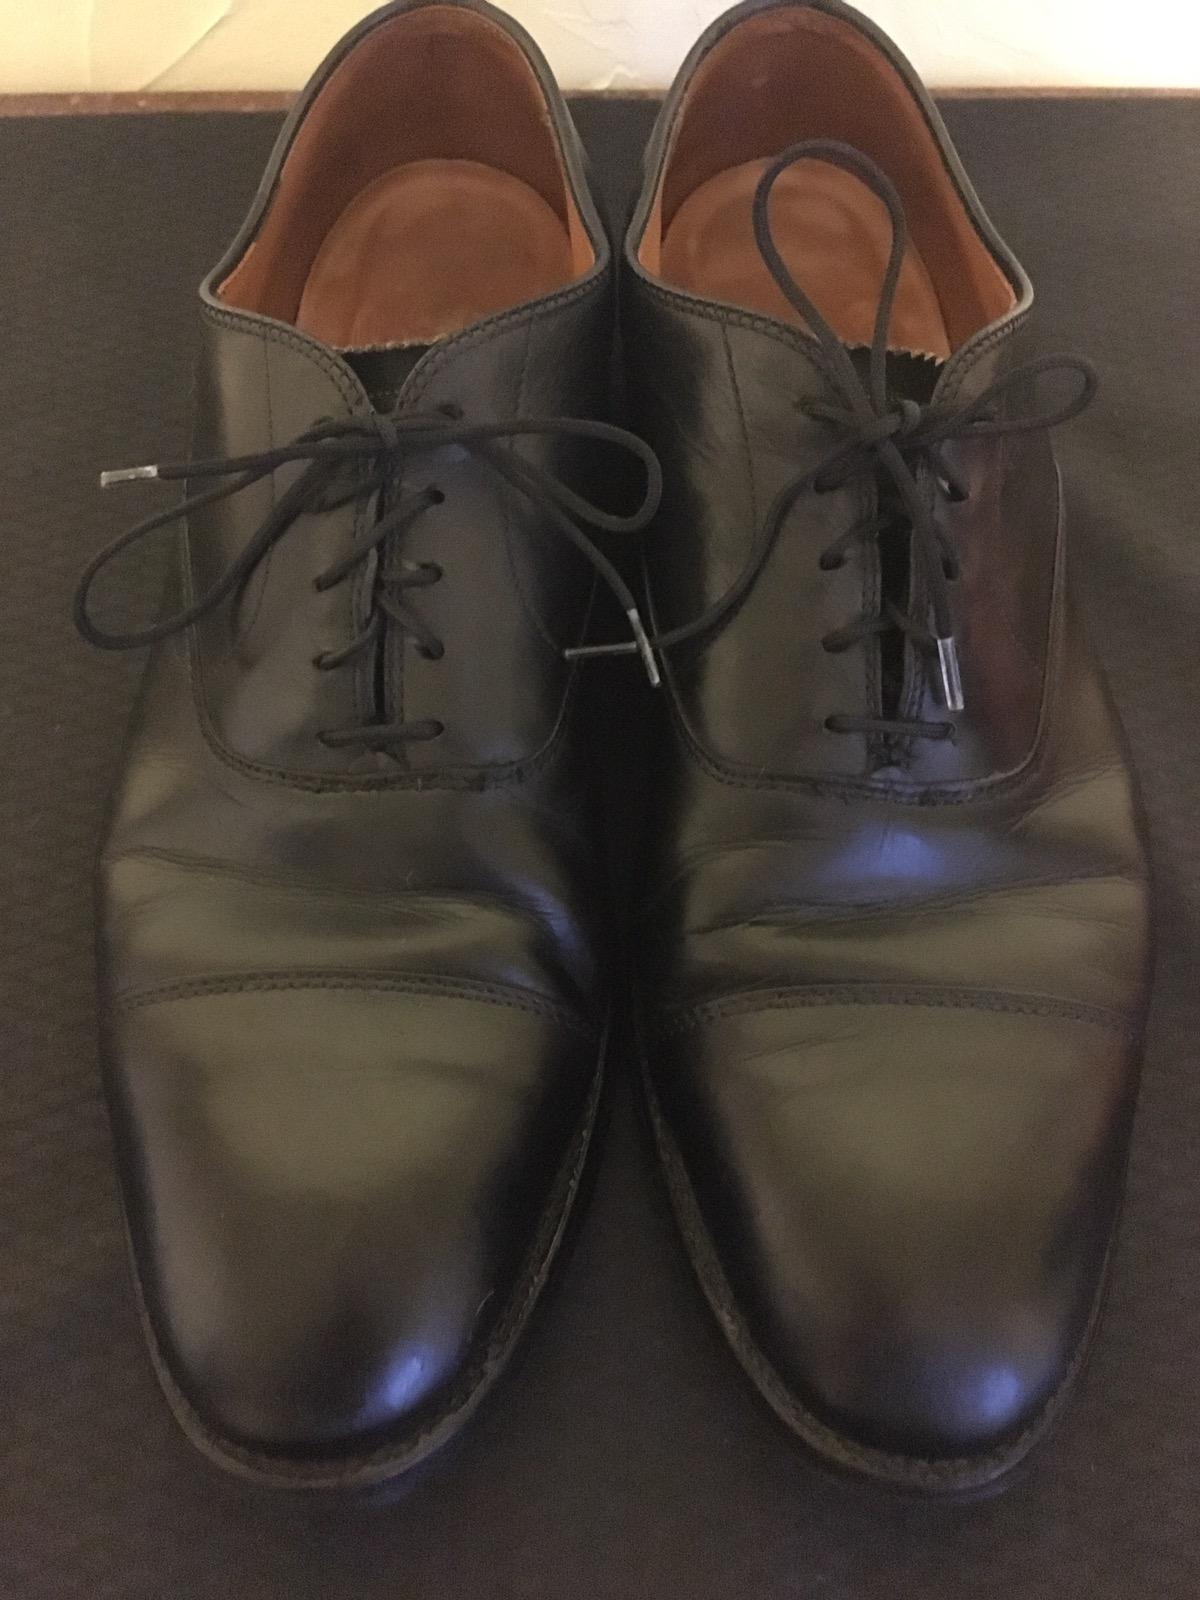 da8be83c4ca2 Alden Shoes 0